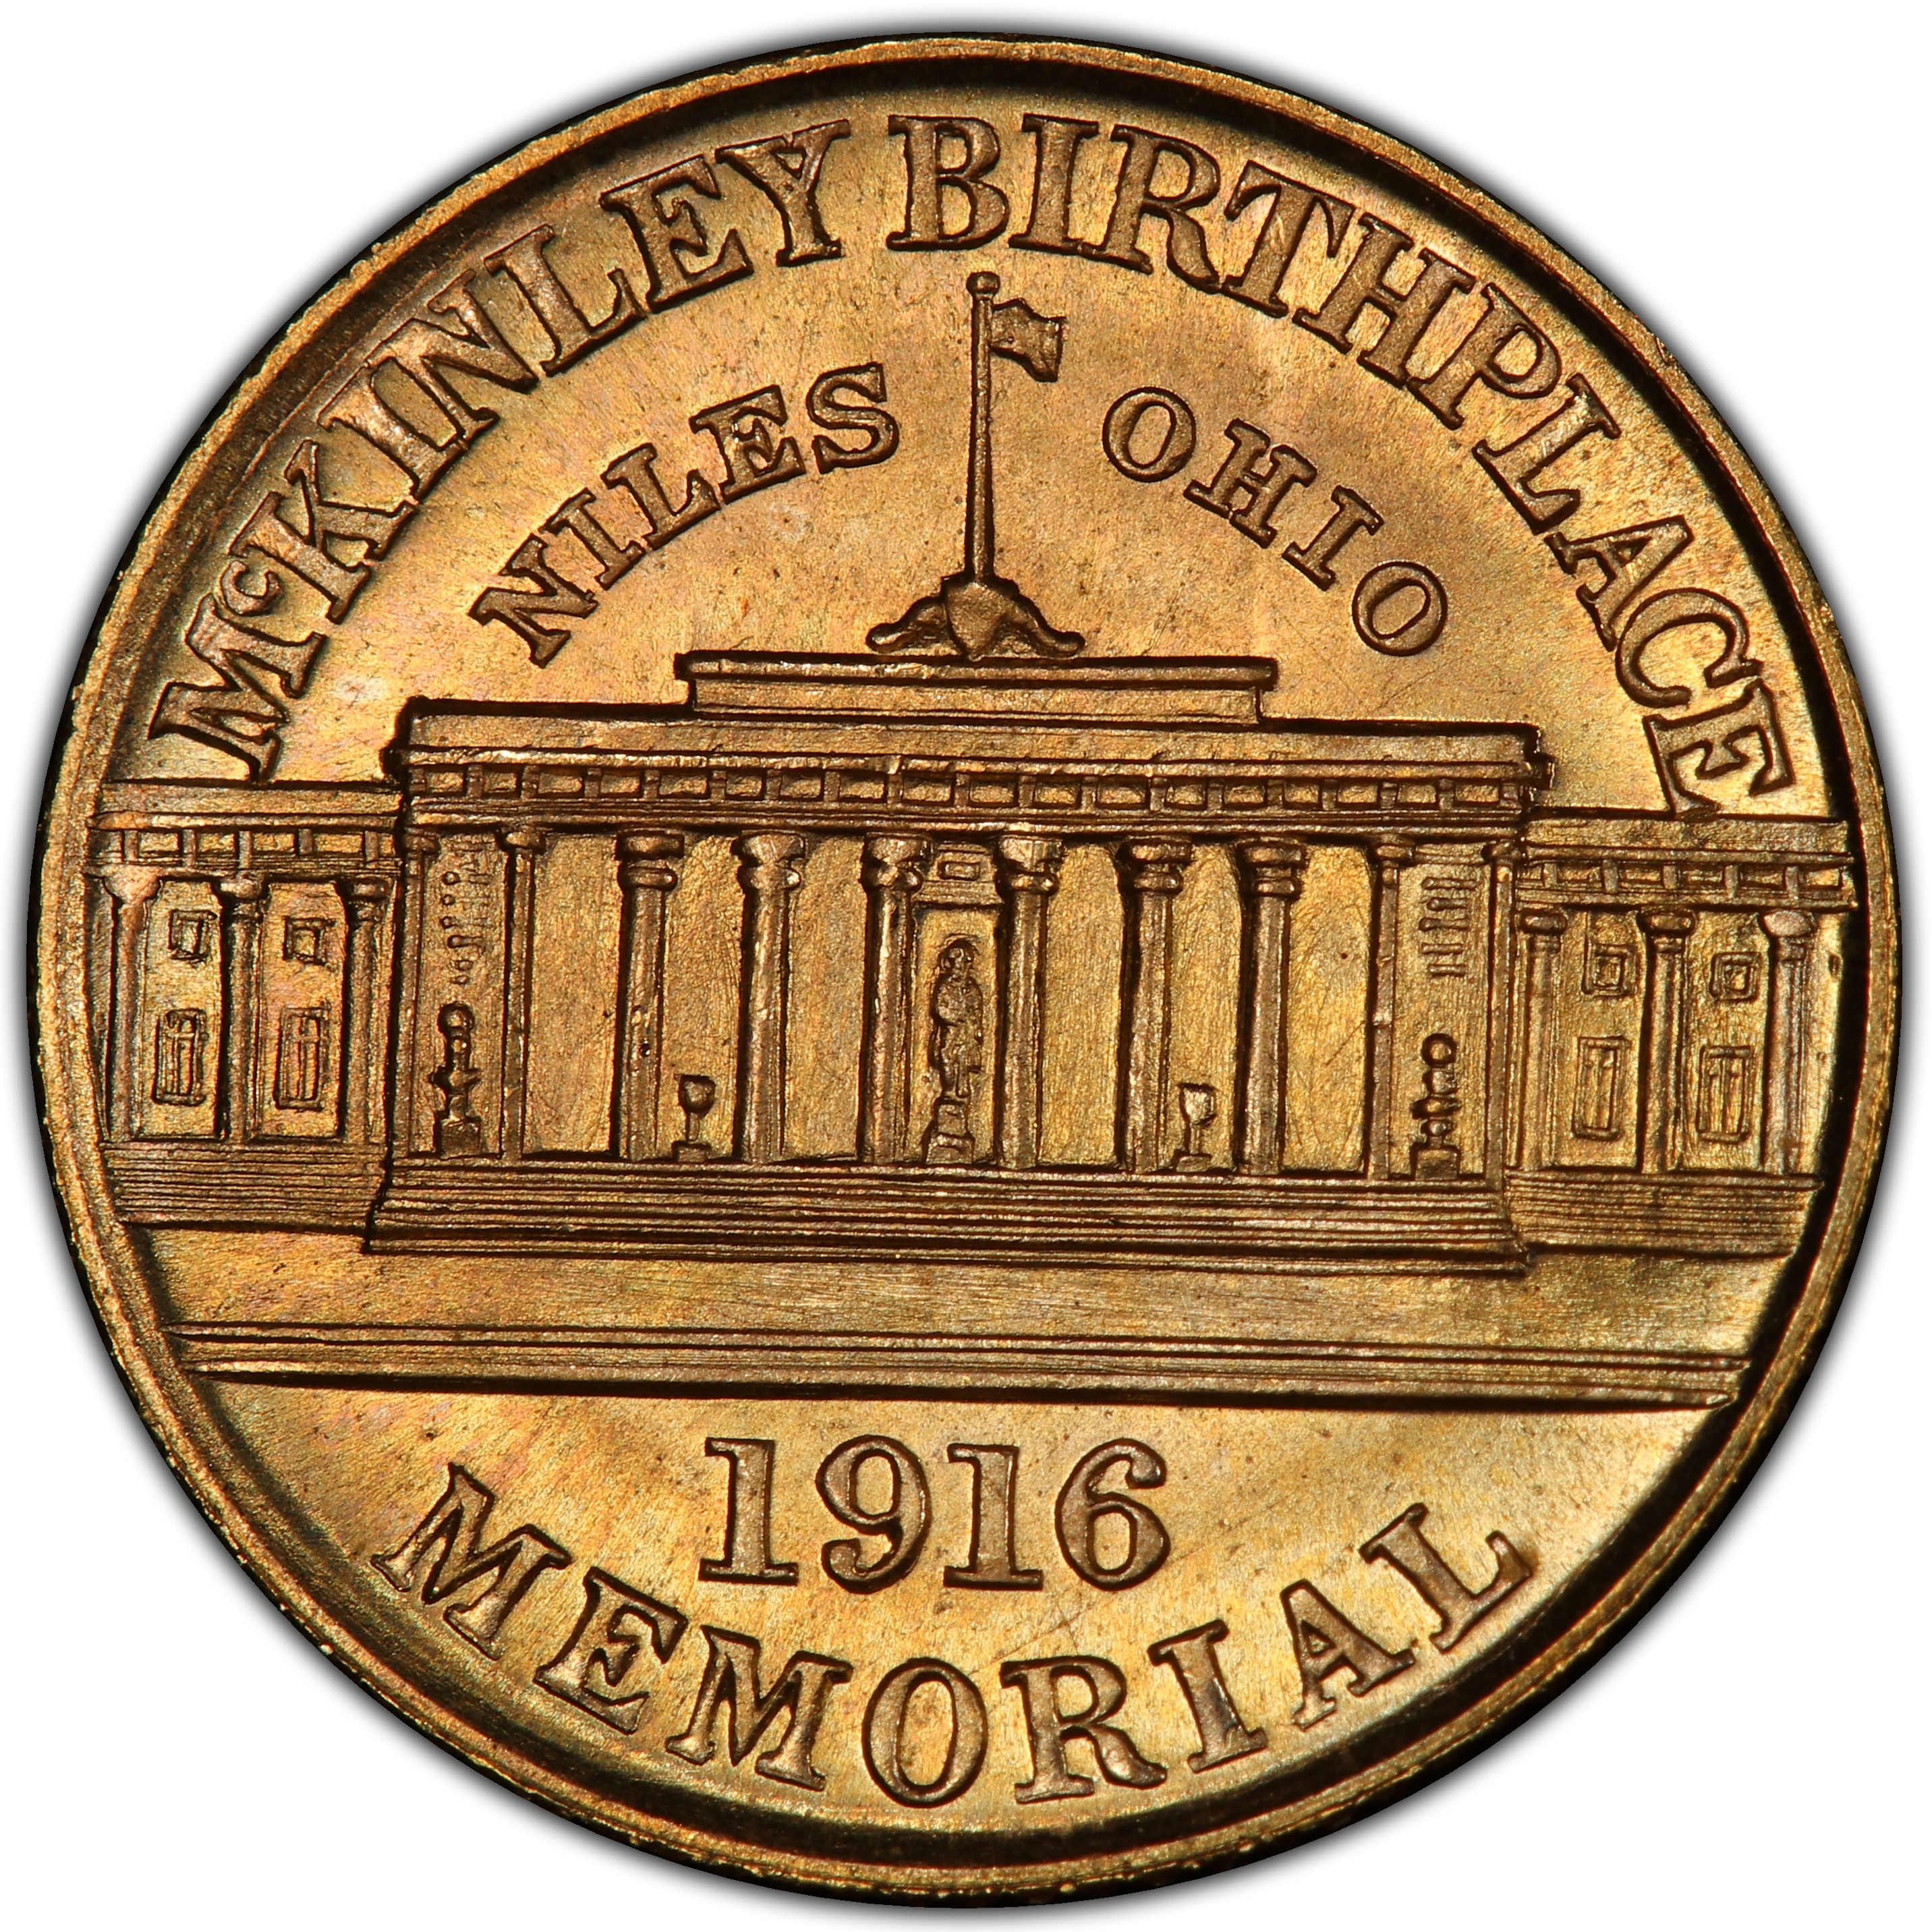 1916_McKinley_Birthplace_Memorial_uncirc